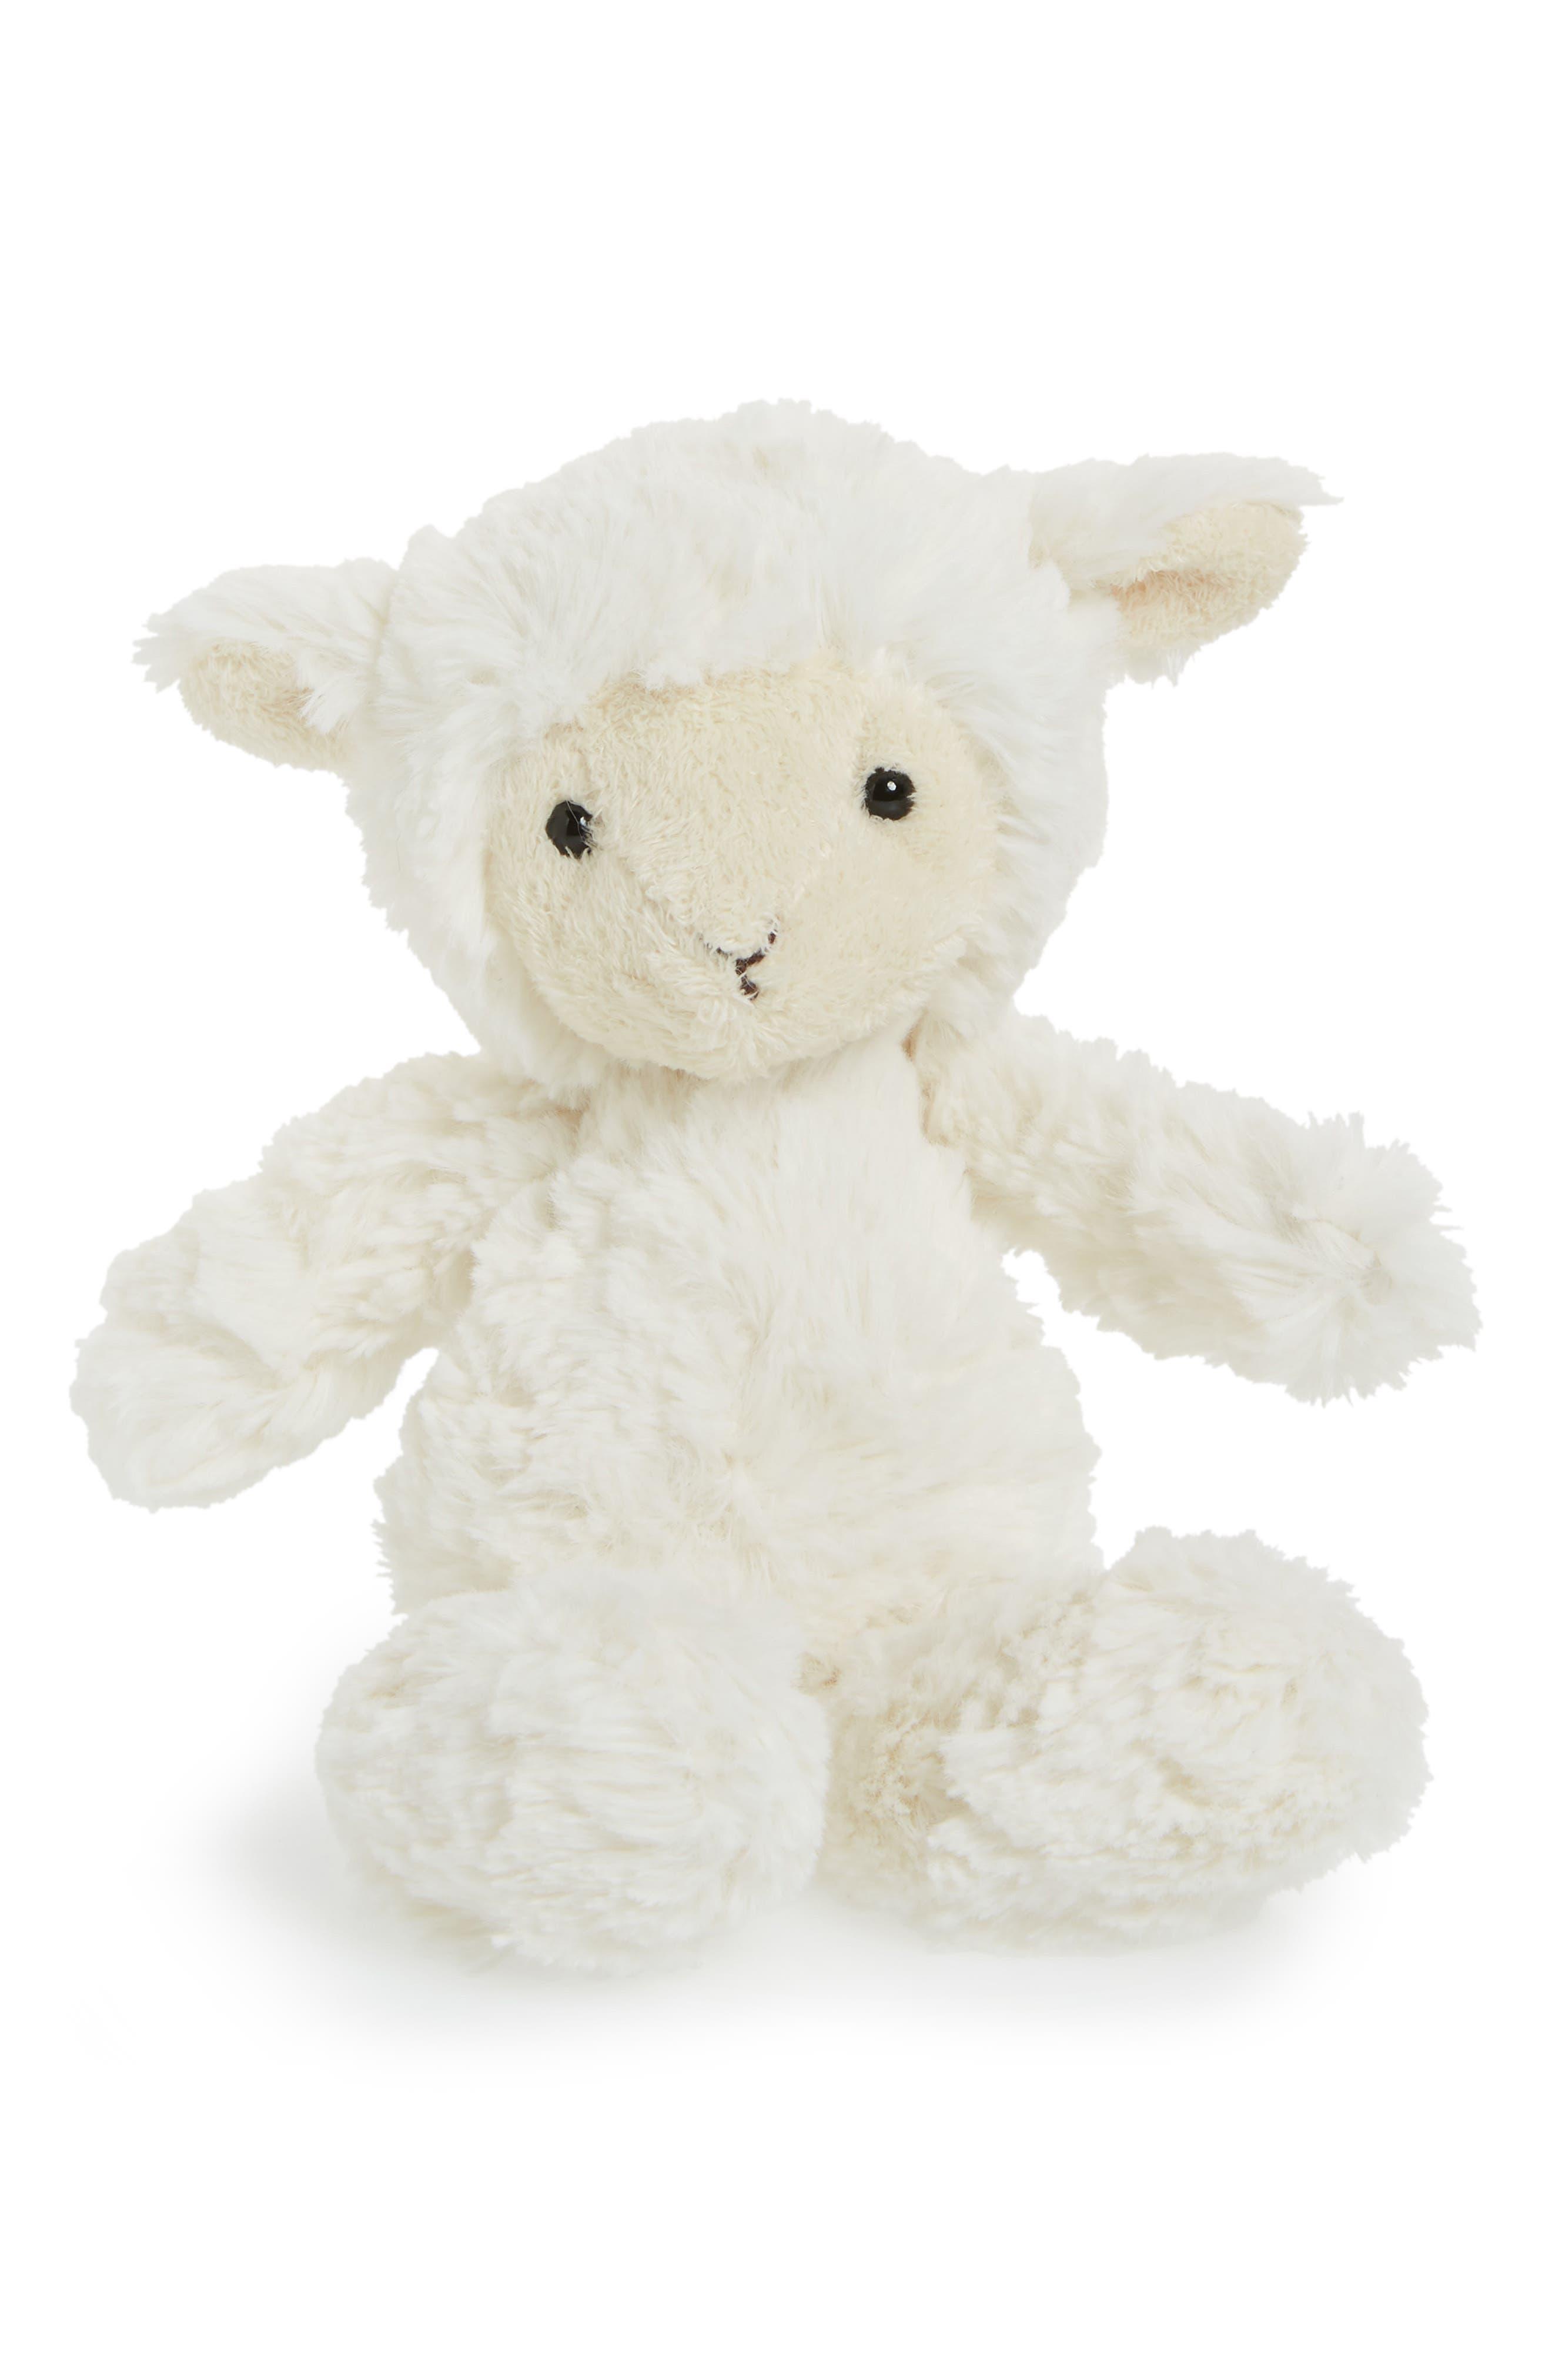 Squiggle Lamb Stuffed Animal,                             Main thumbnail 1, color,                             250